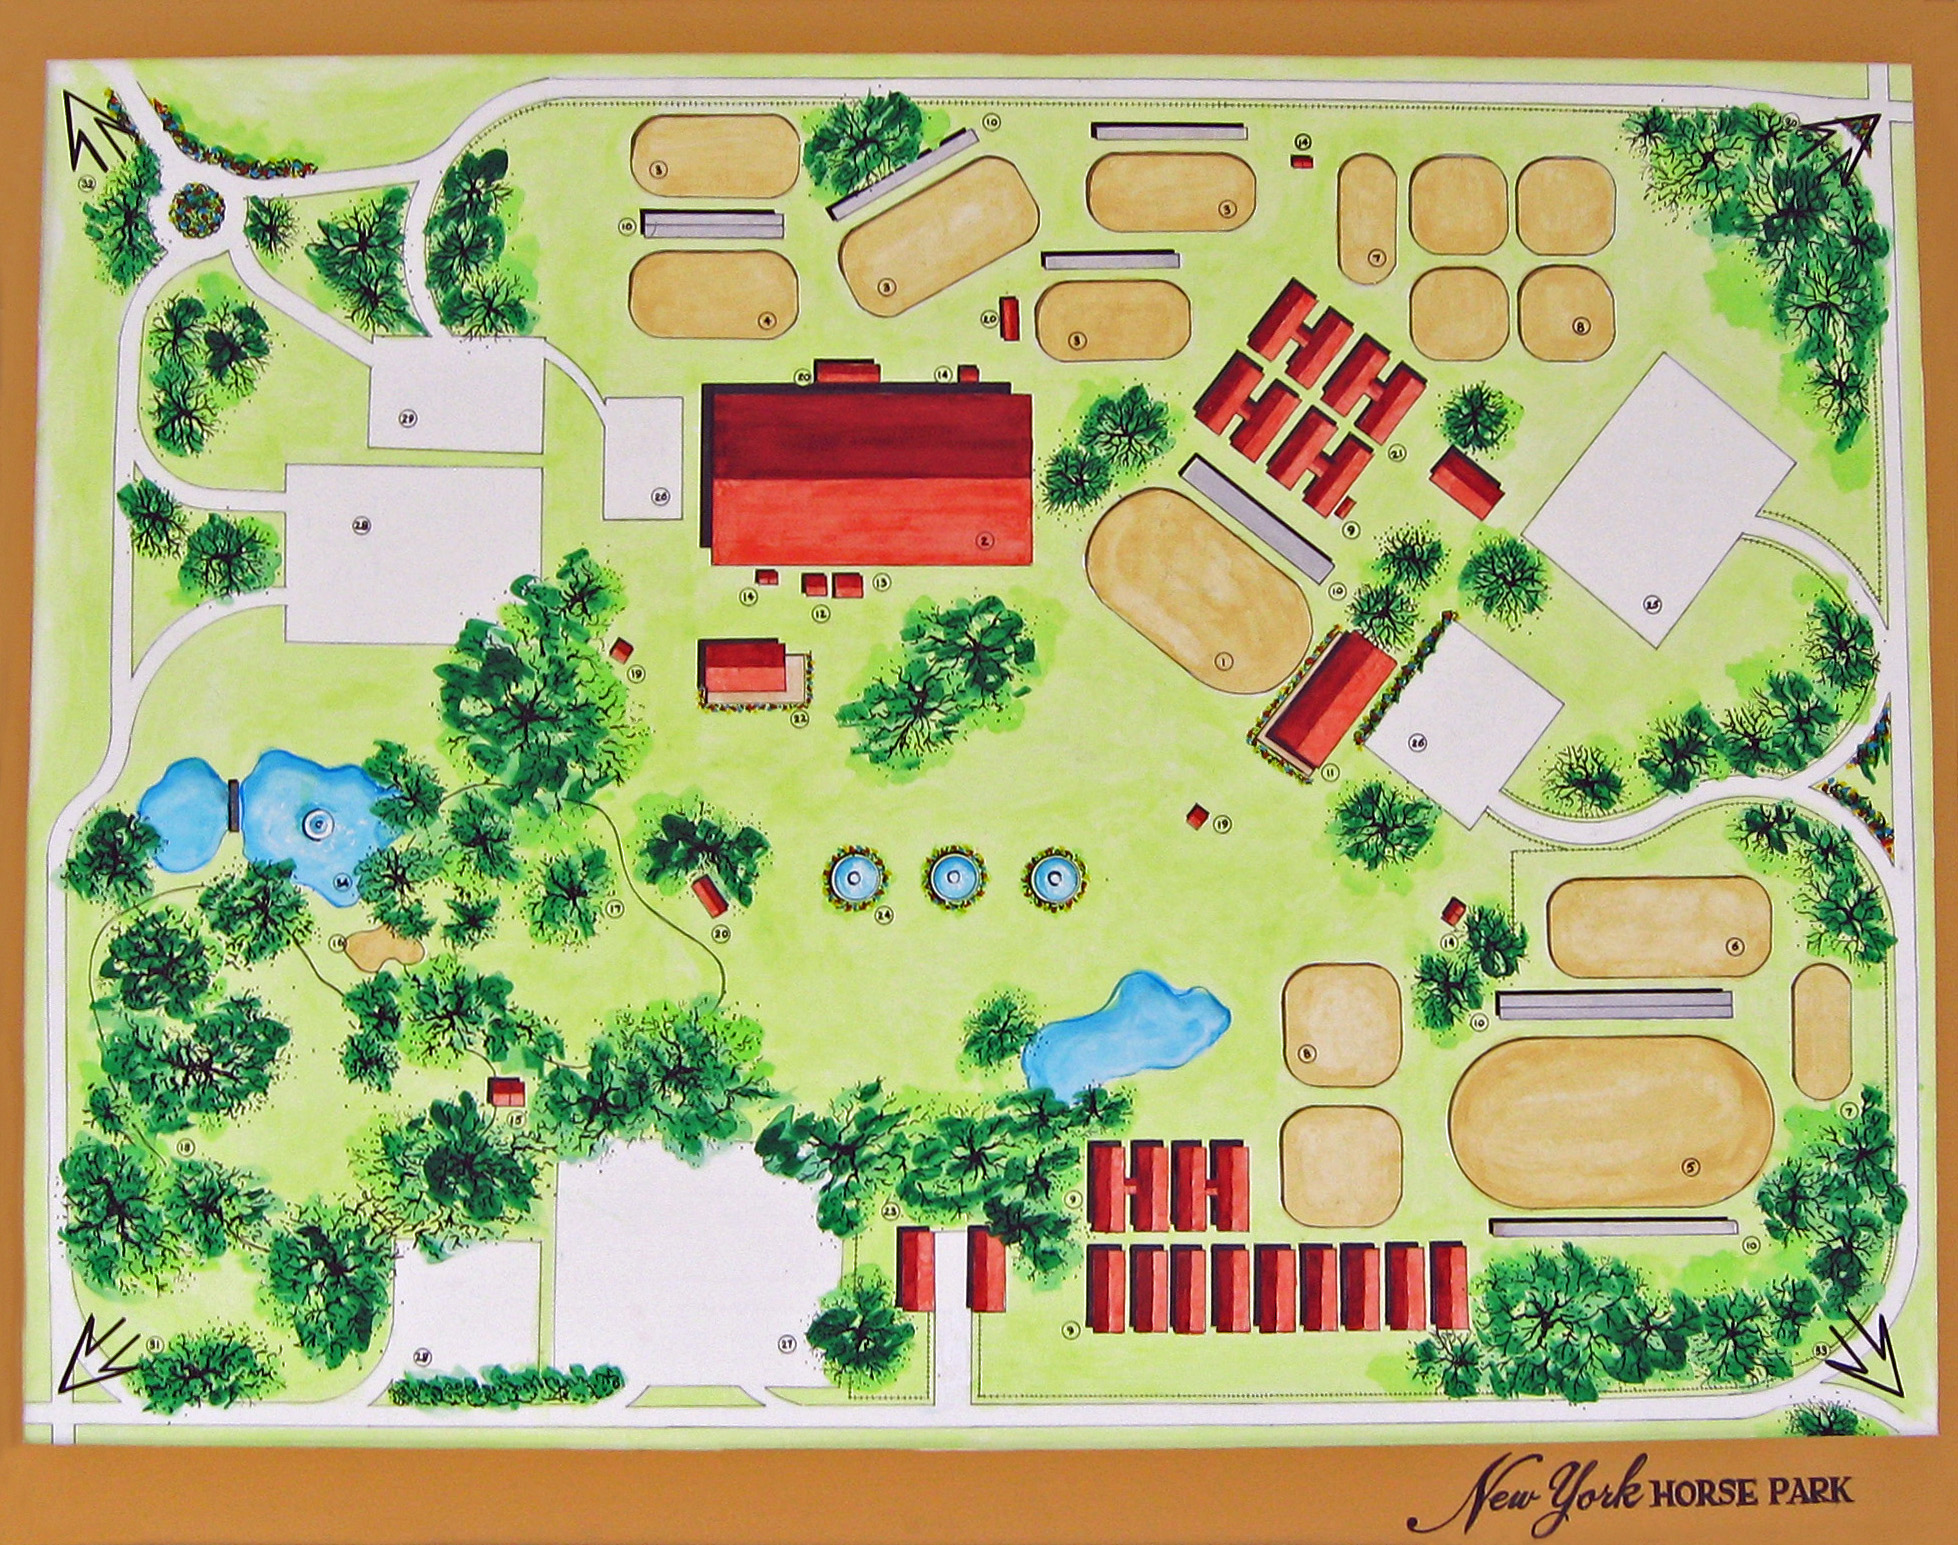 saratoga horse park